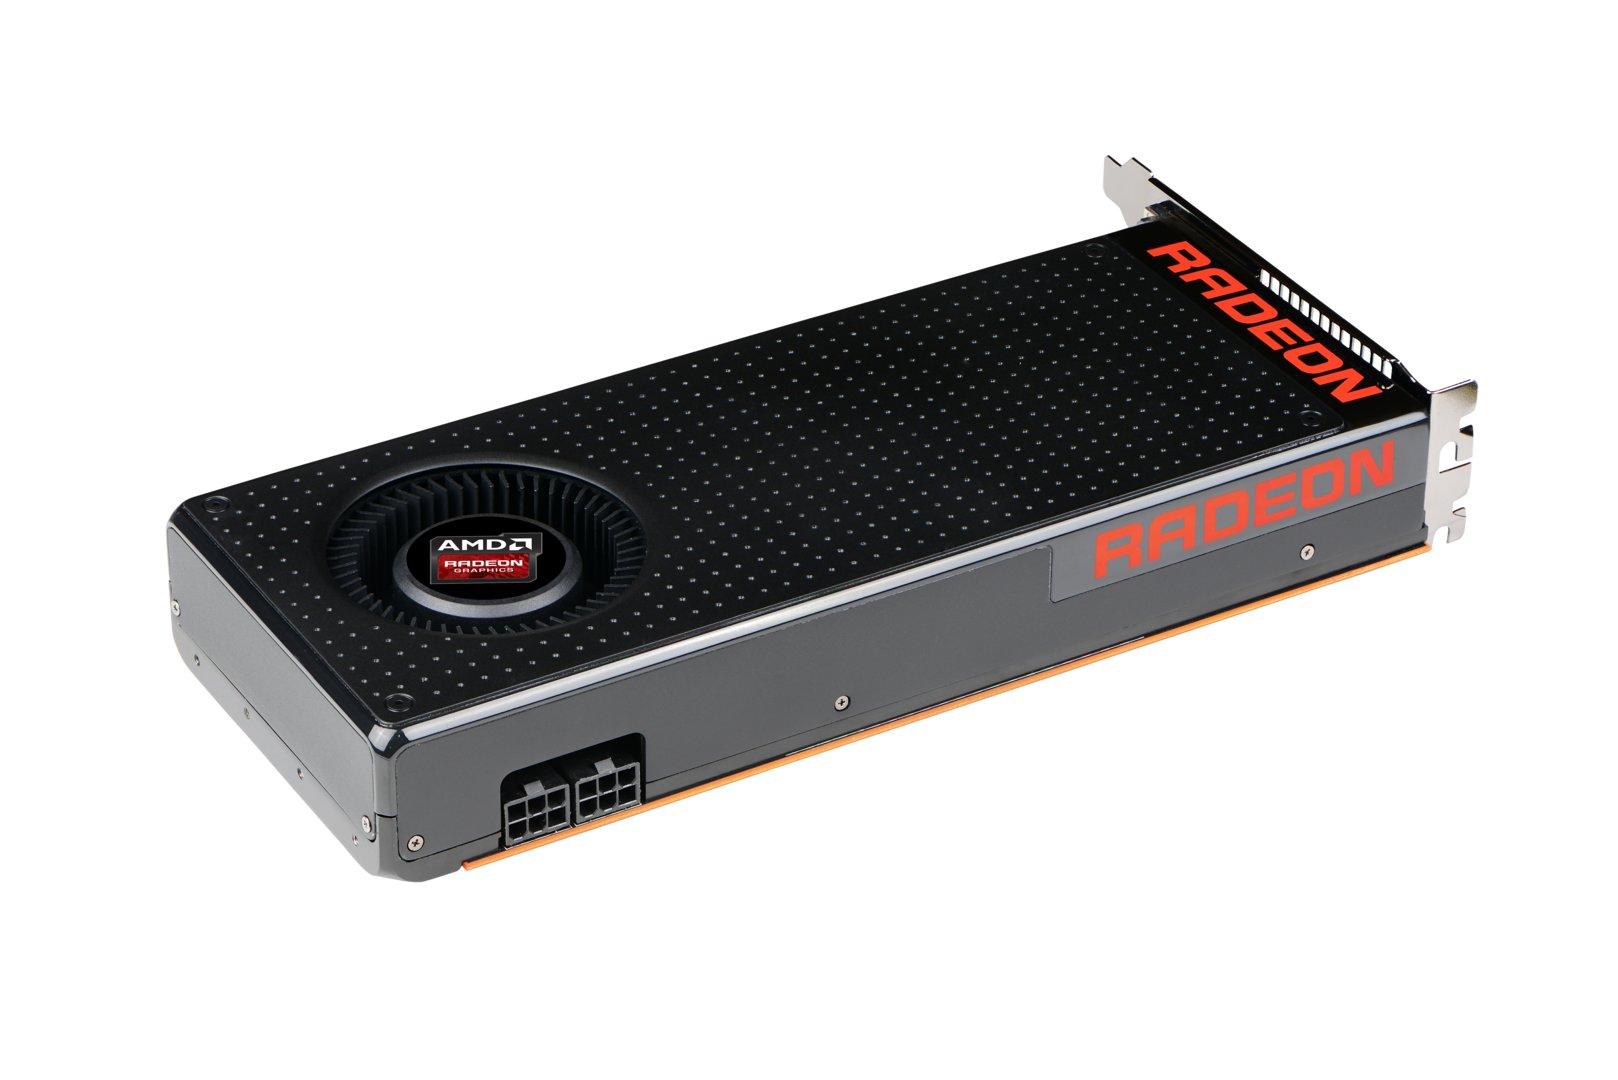 AMD Radeon R9 380